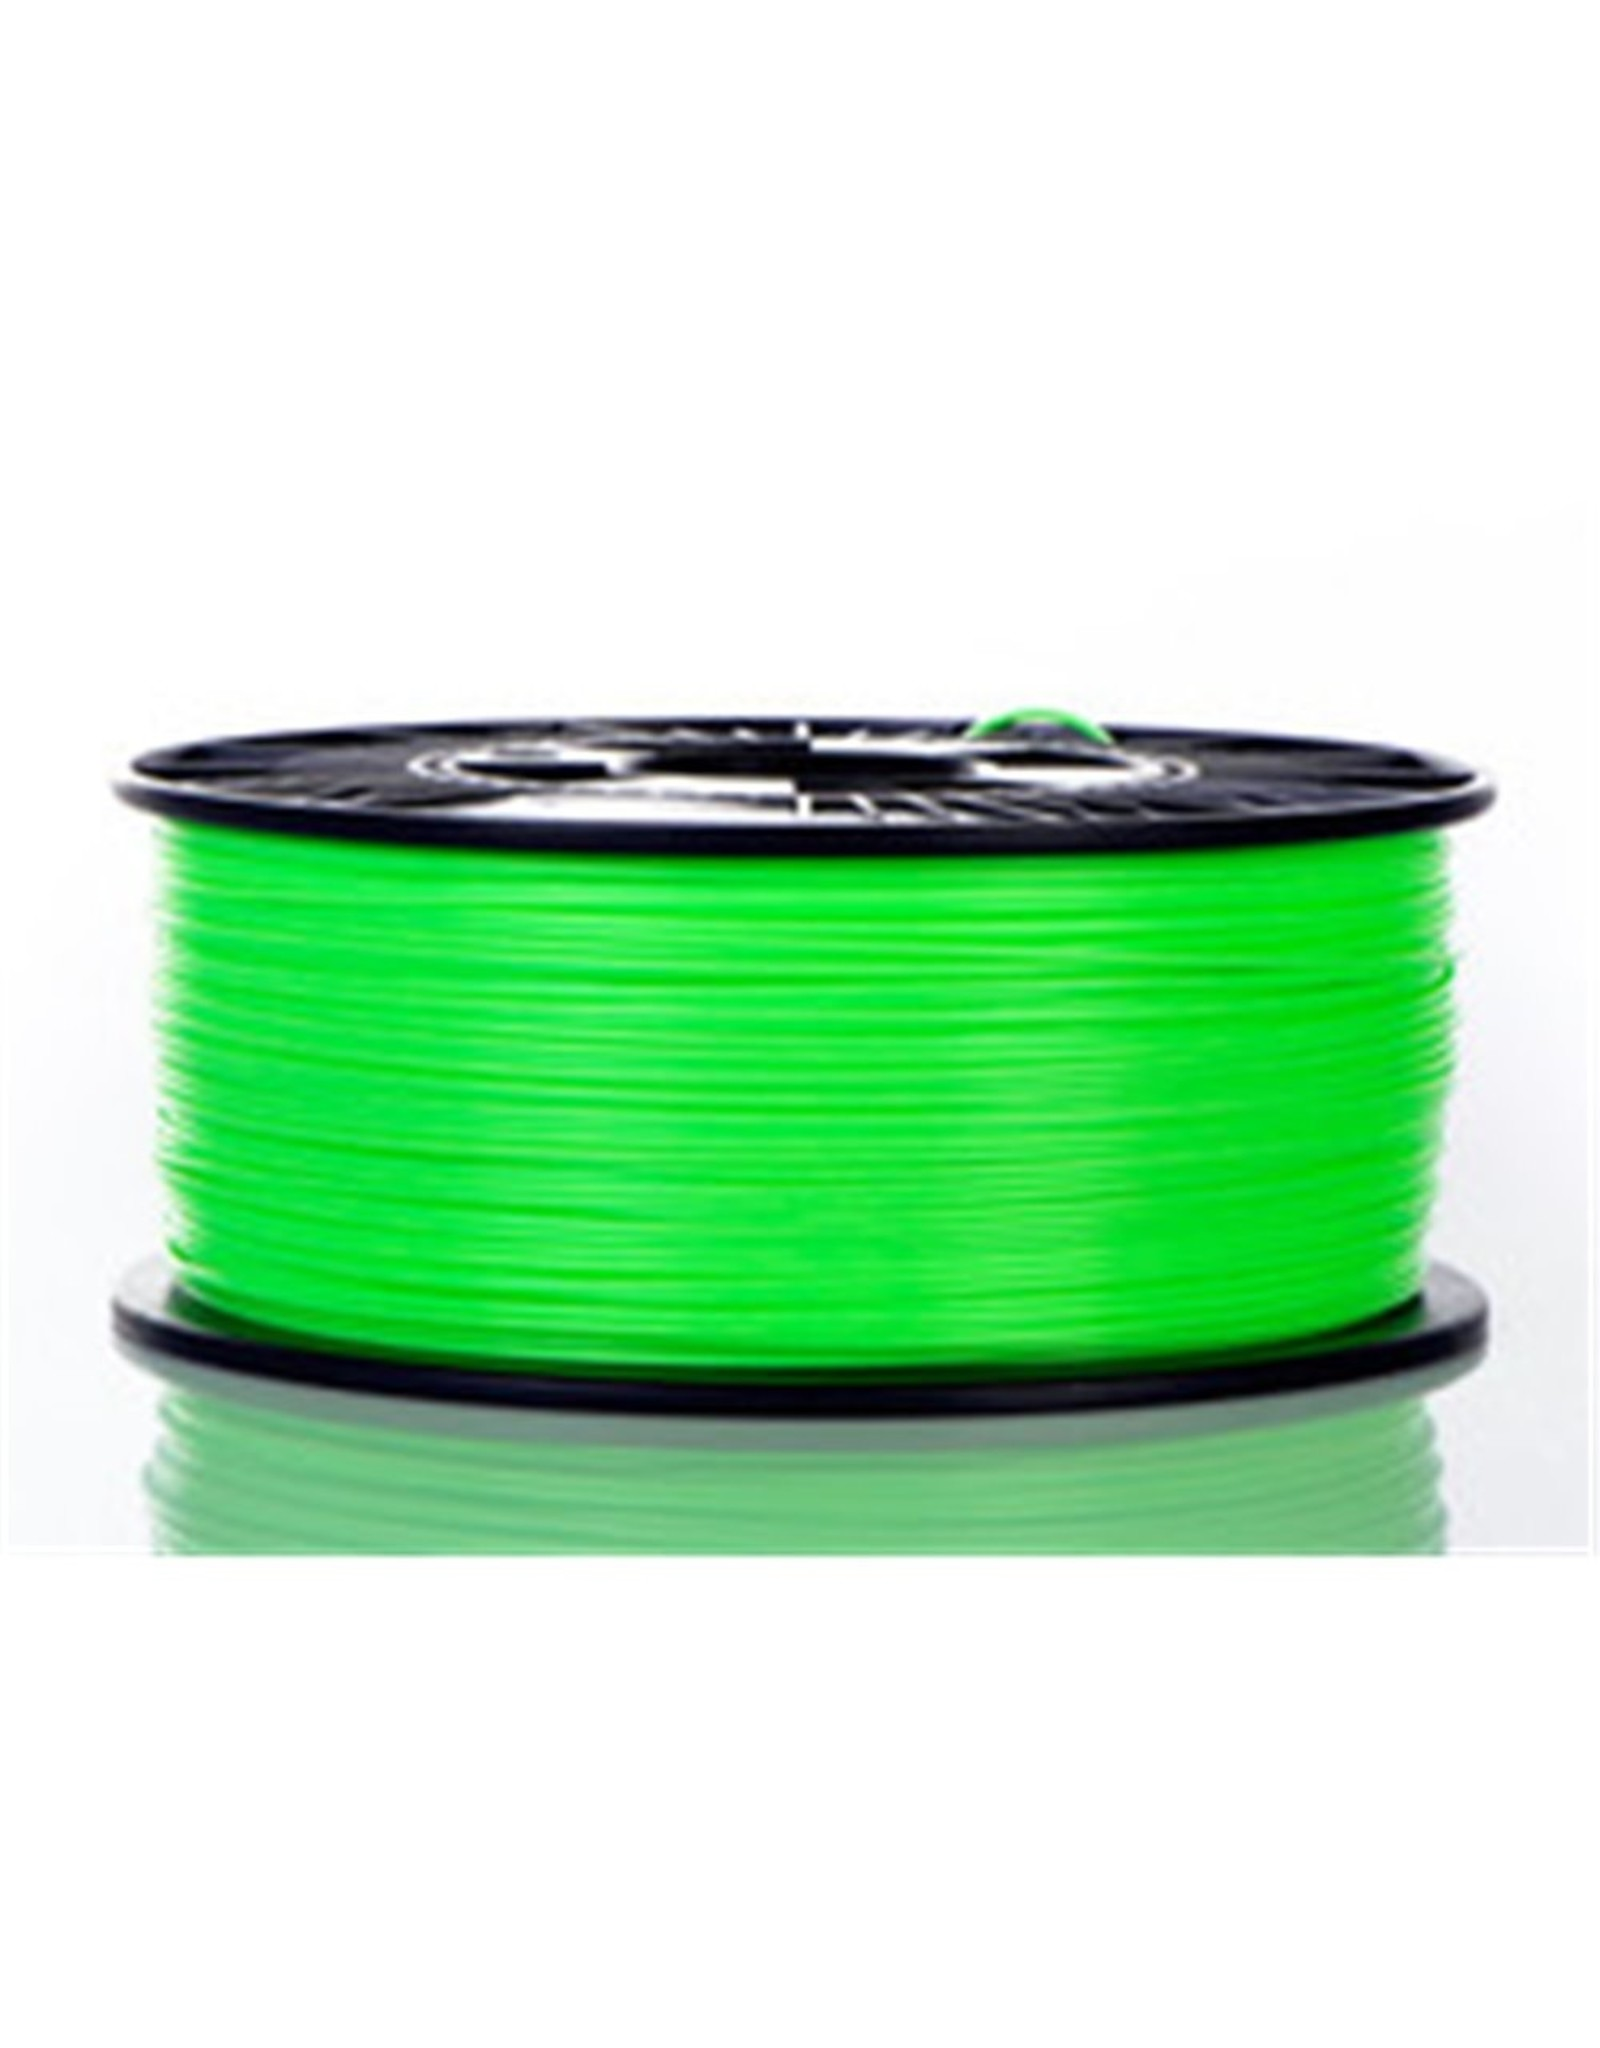 Material4Print ABS Fun Green 1.75mm